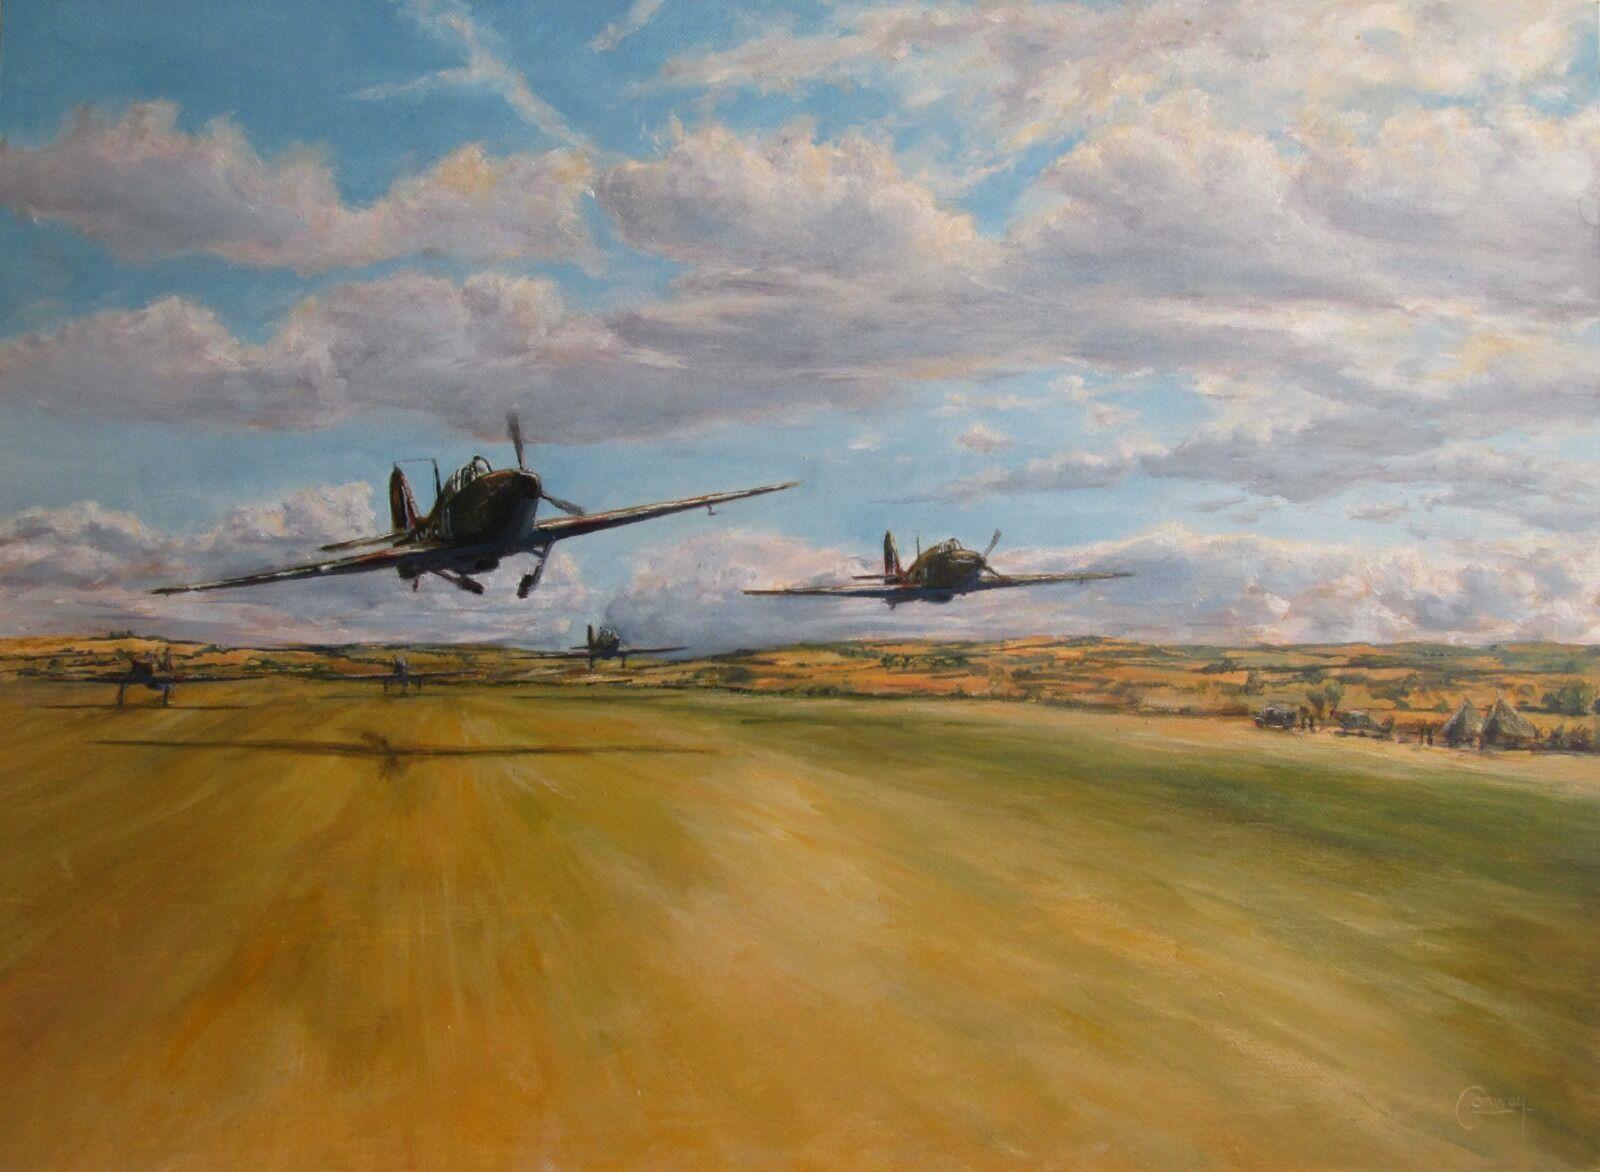 """One Squadron Scramble"" - Hurricanes of No. 1 Squadron"